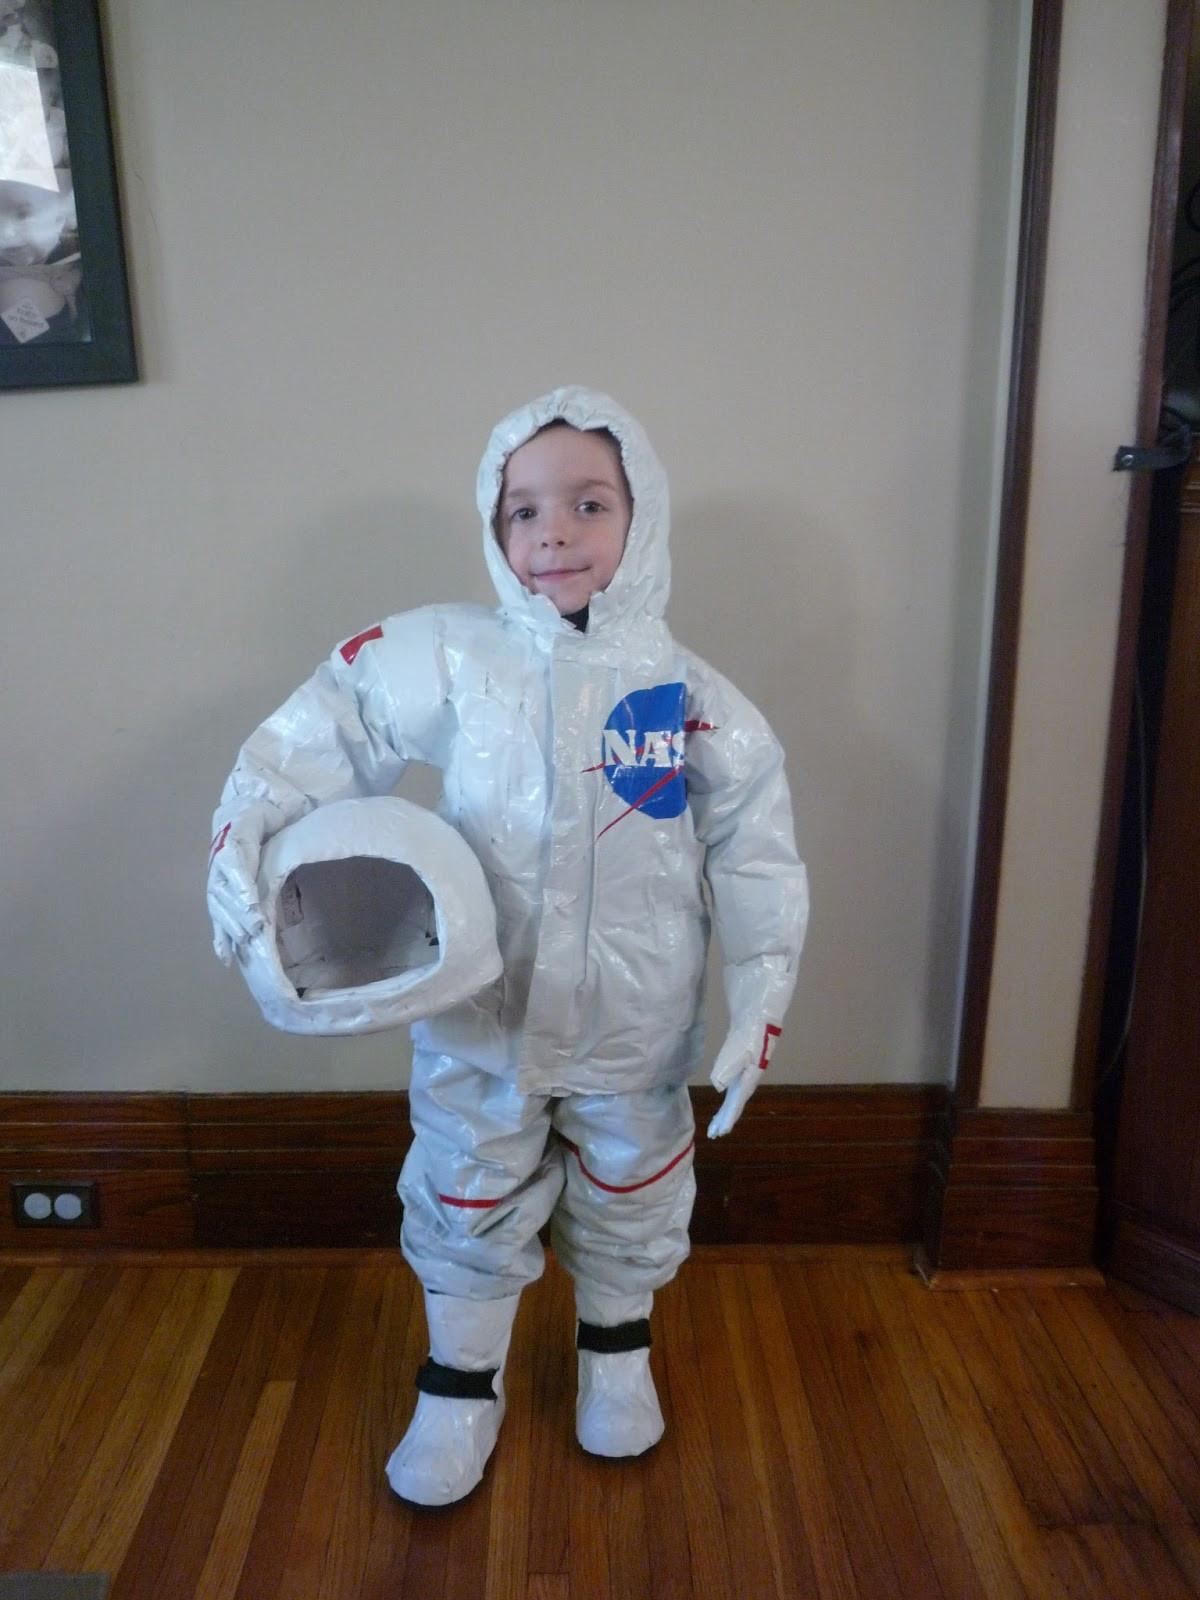 DIY Kids Astronaut Costume  Full Time Frugal DIY childs costume $13 Astronaut